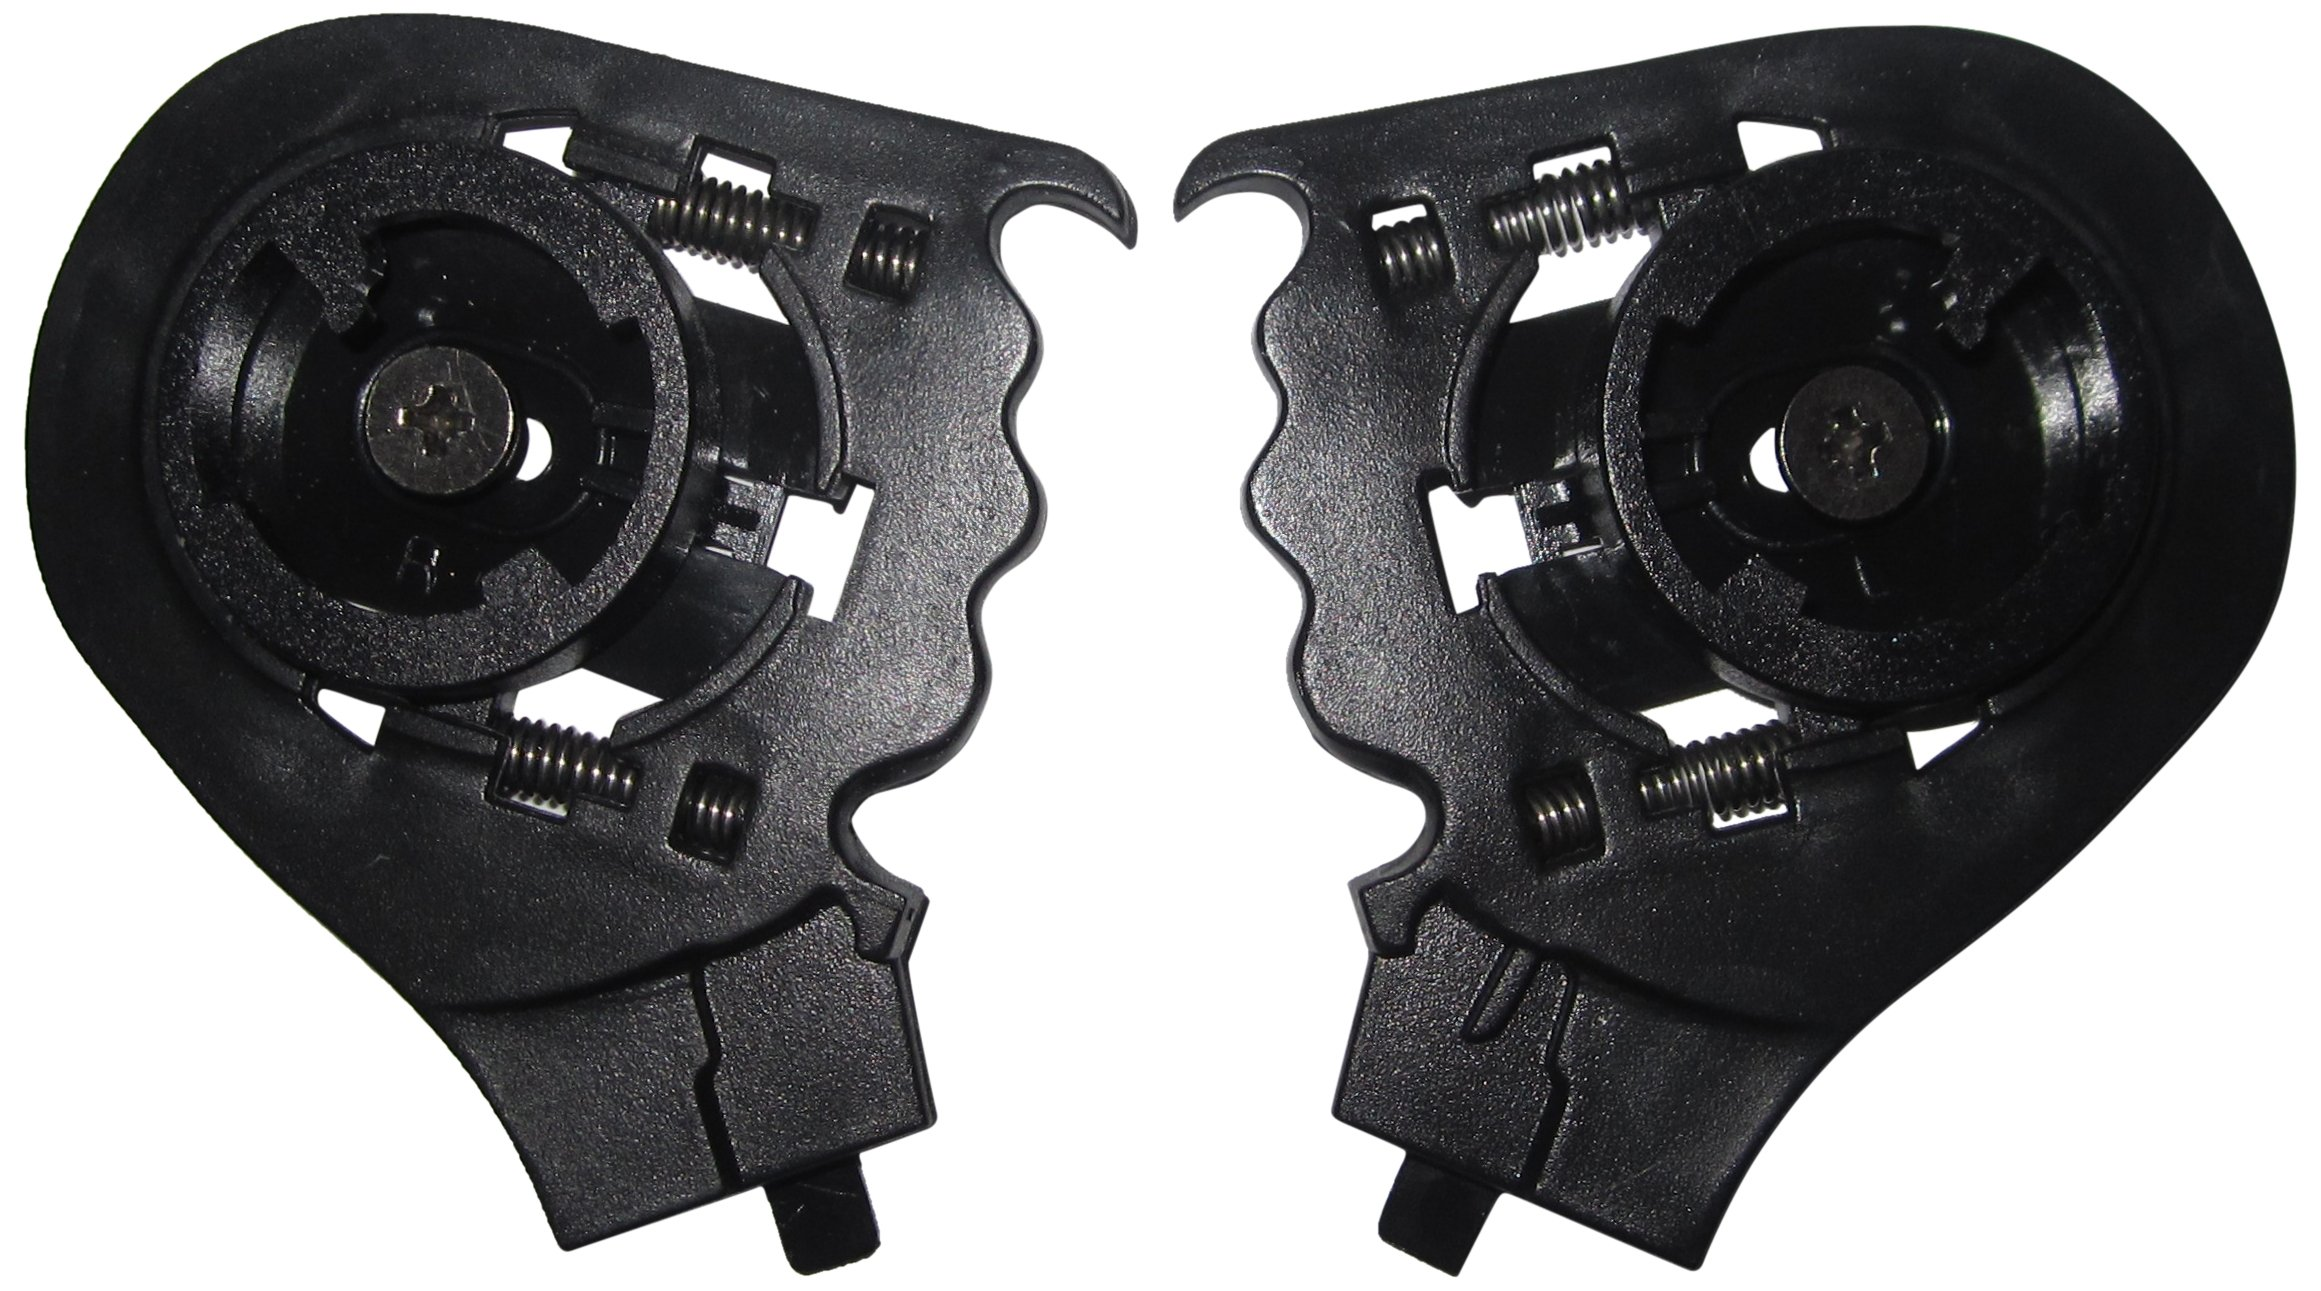 LS2 Helmets 02-164 Visor Replacement Side Plate for OF569 Helmets (Black)